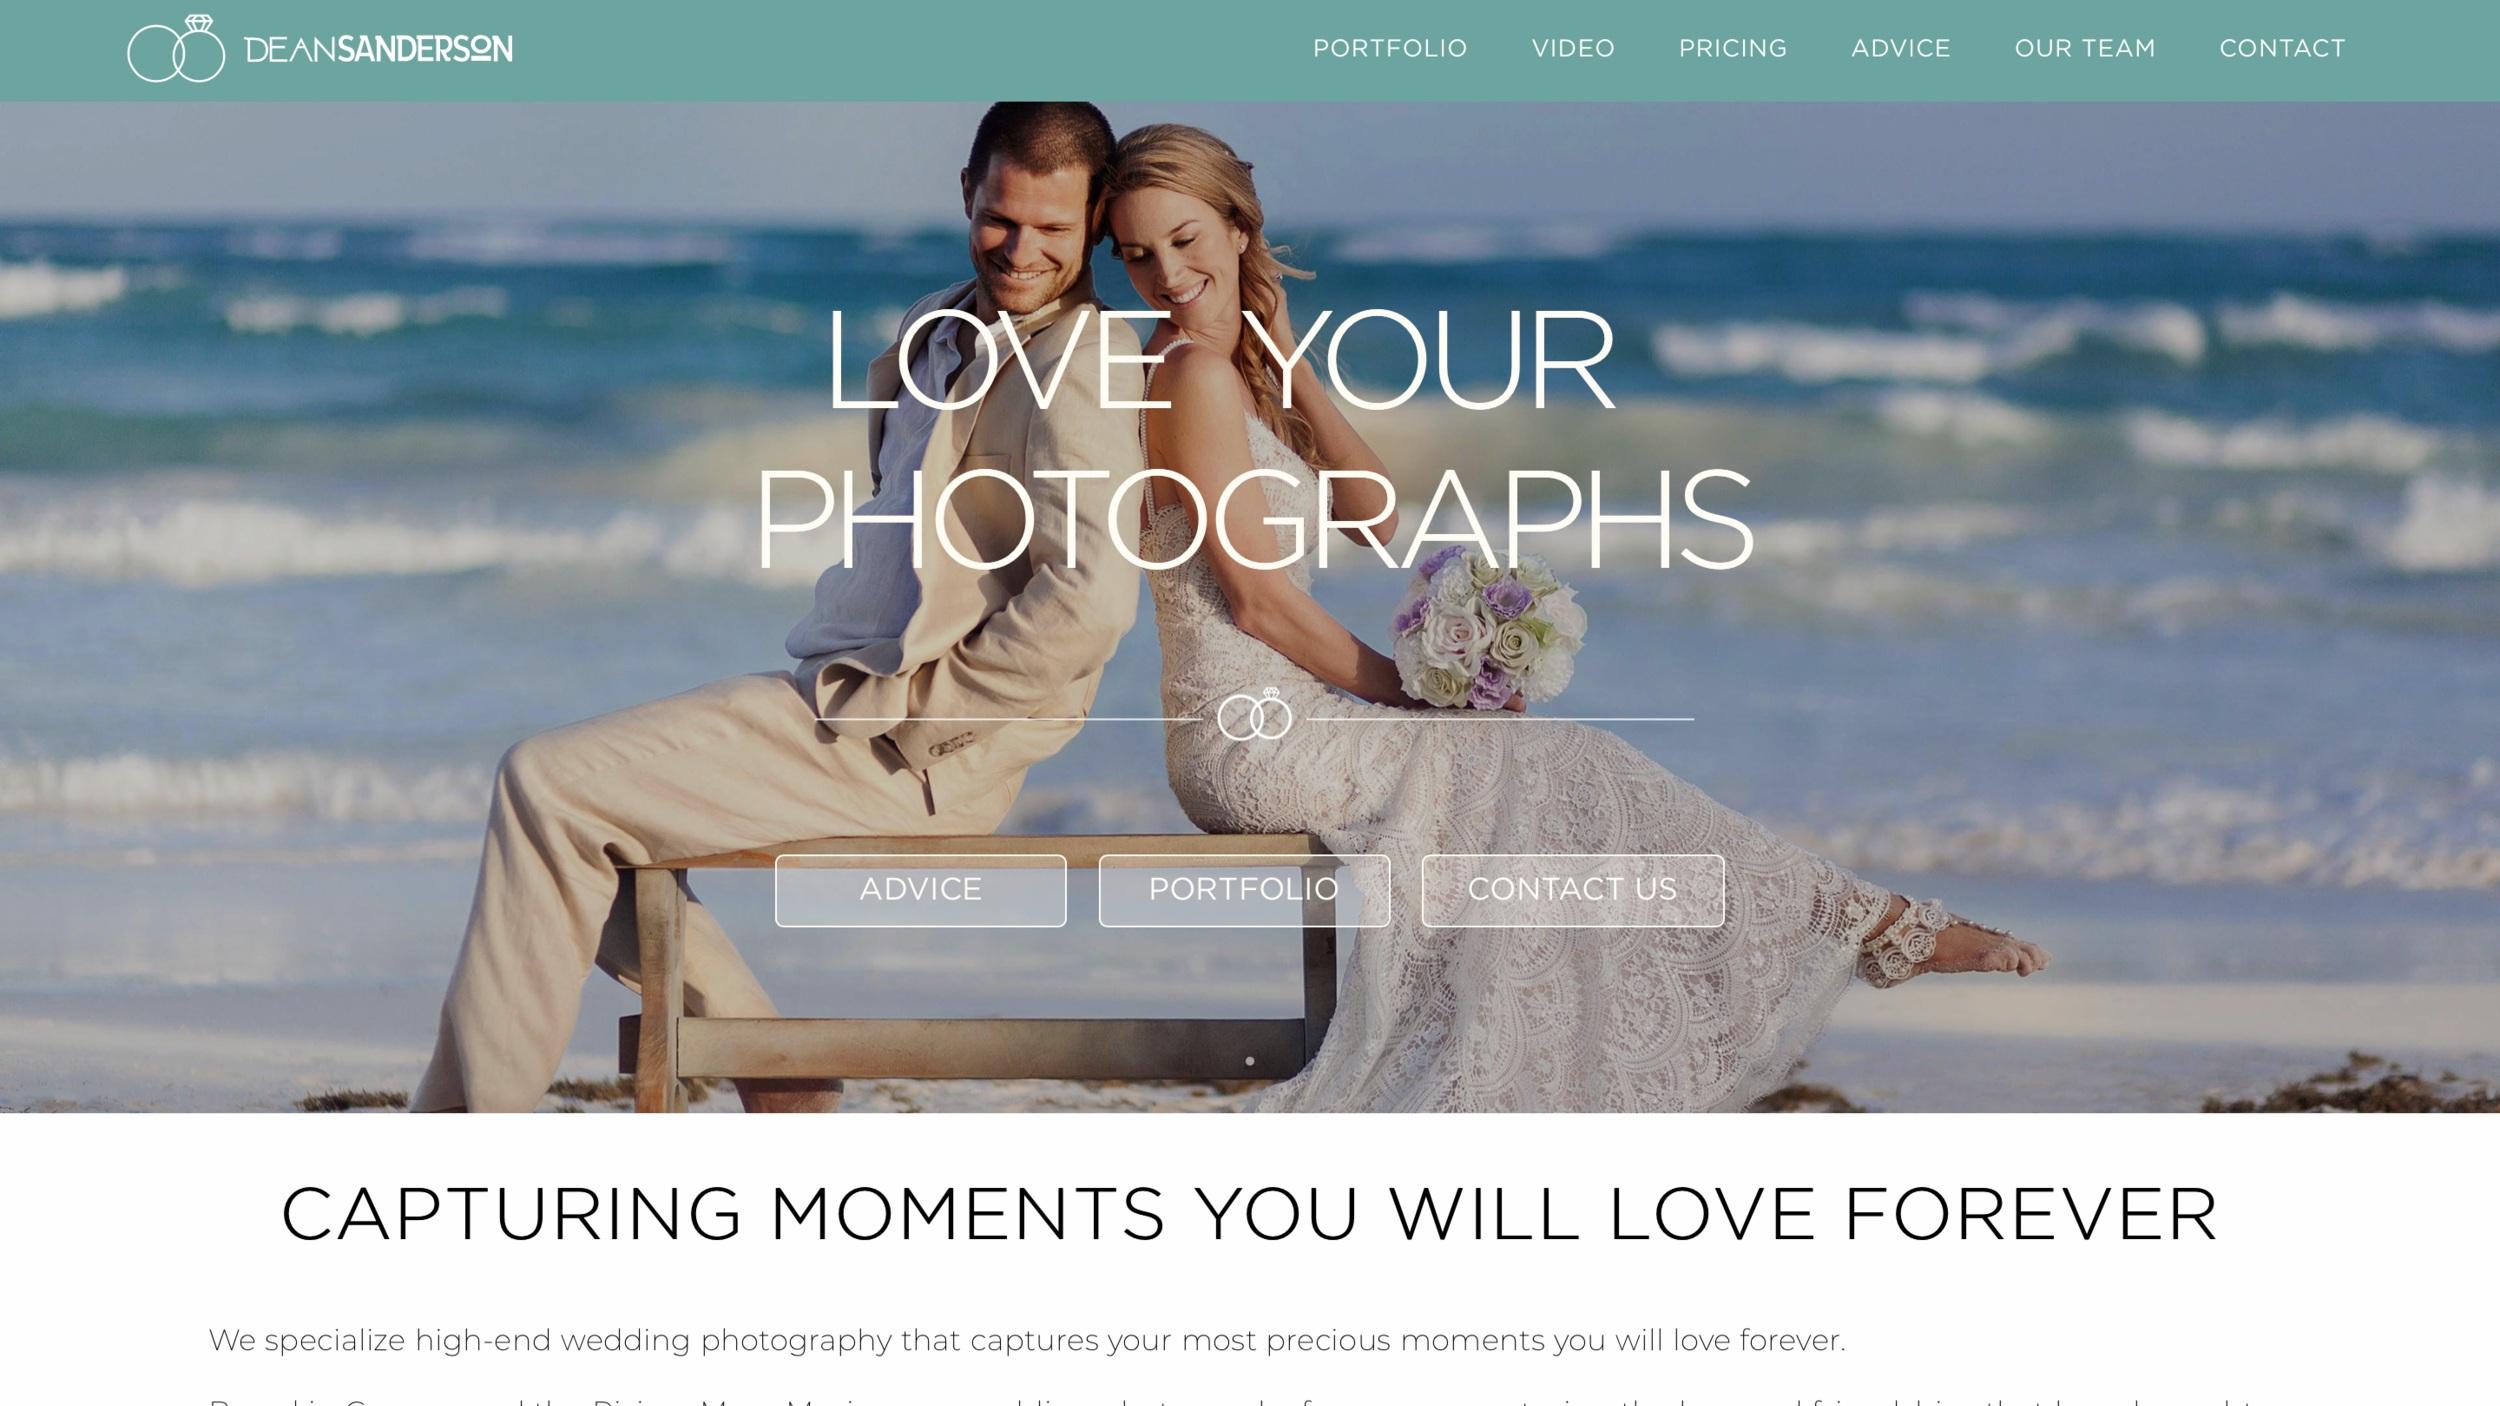 Best Pinterest Marketing for the wedding industry. Dean Sanderson Weddings https://deansandersonweddings.com